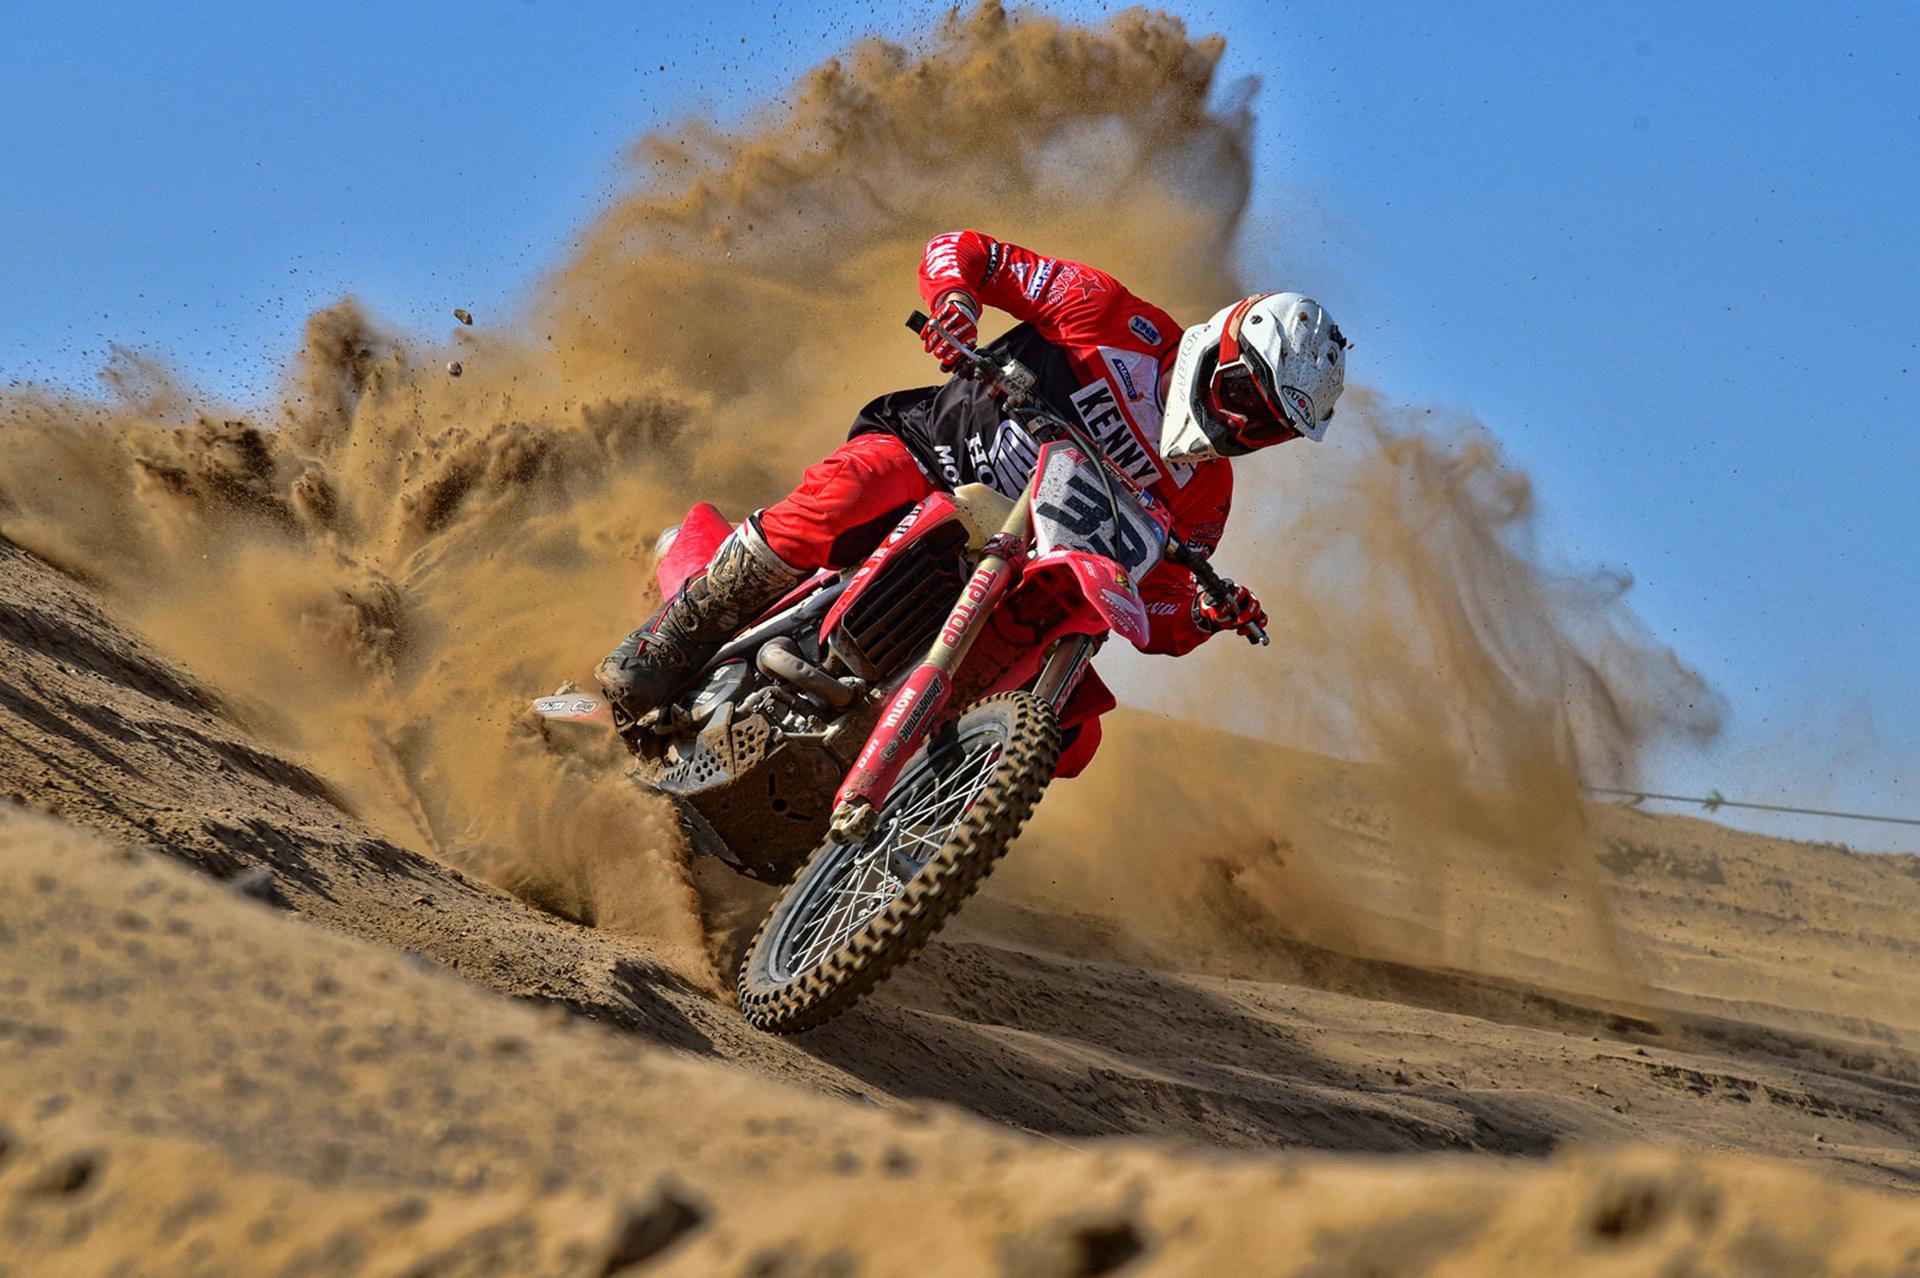 S01E05: Lars van Berkel over BMX, Dakar en tinderdates